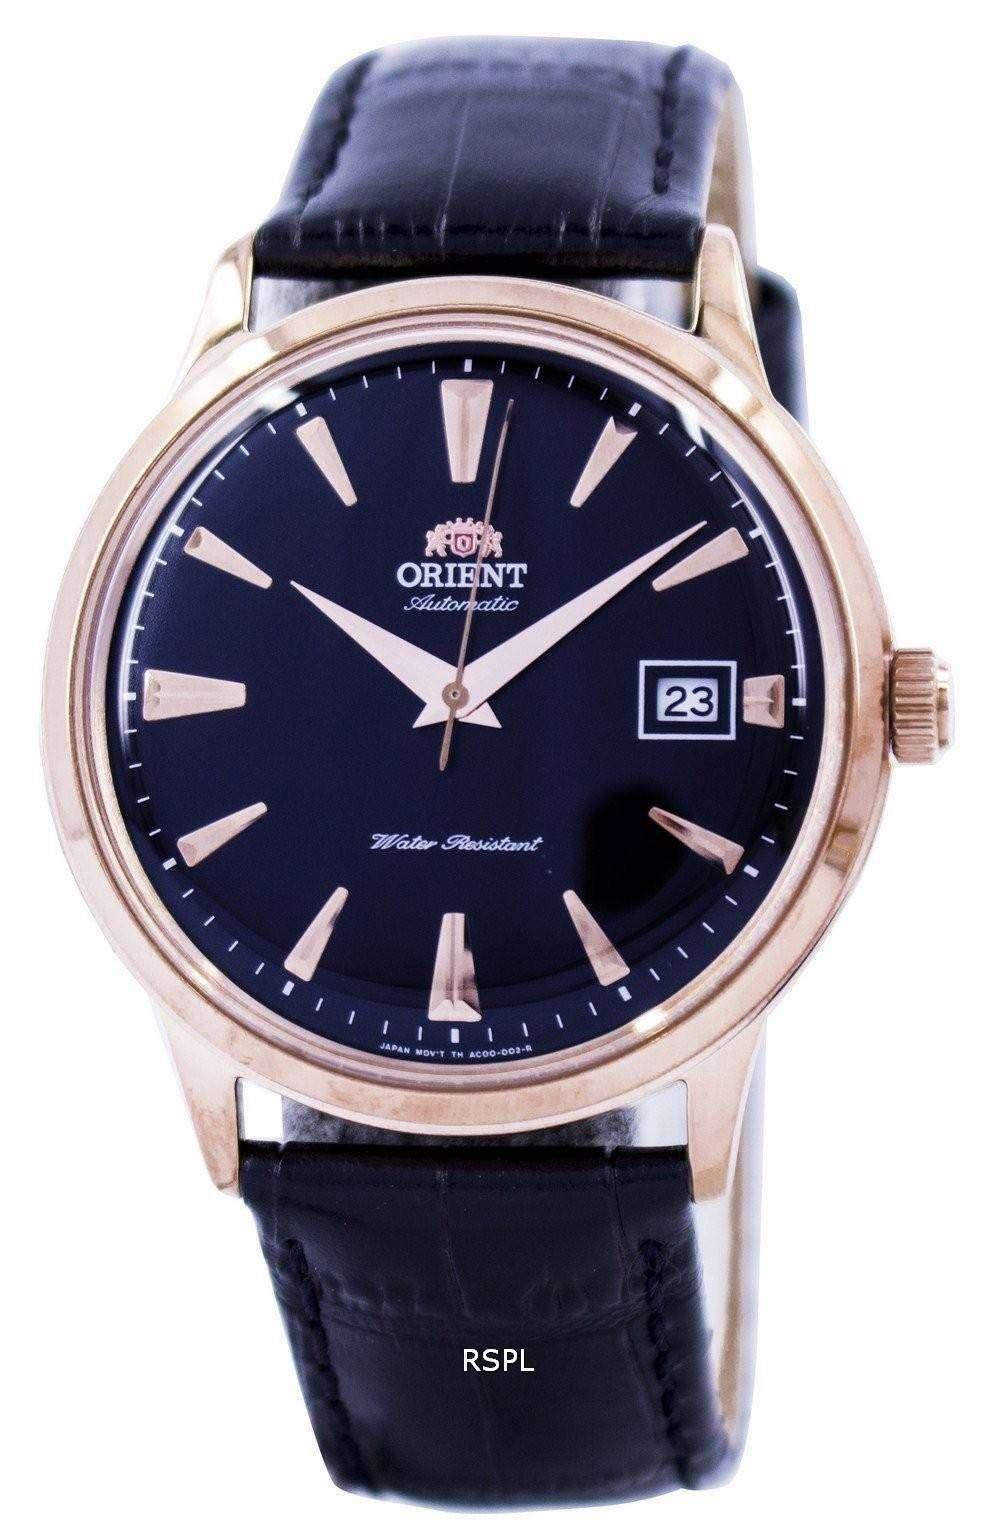 Orient 2nd Generation Bambino Classic Automatic FAC00001B0 Men's Watch